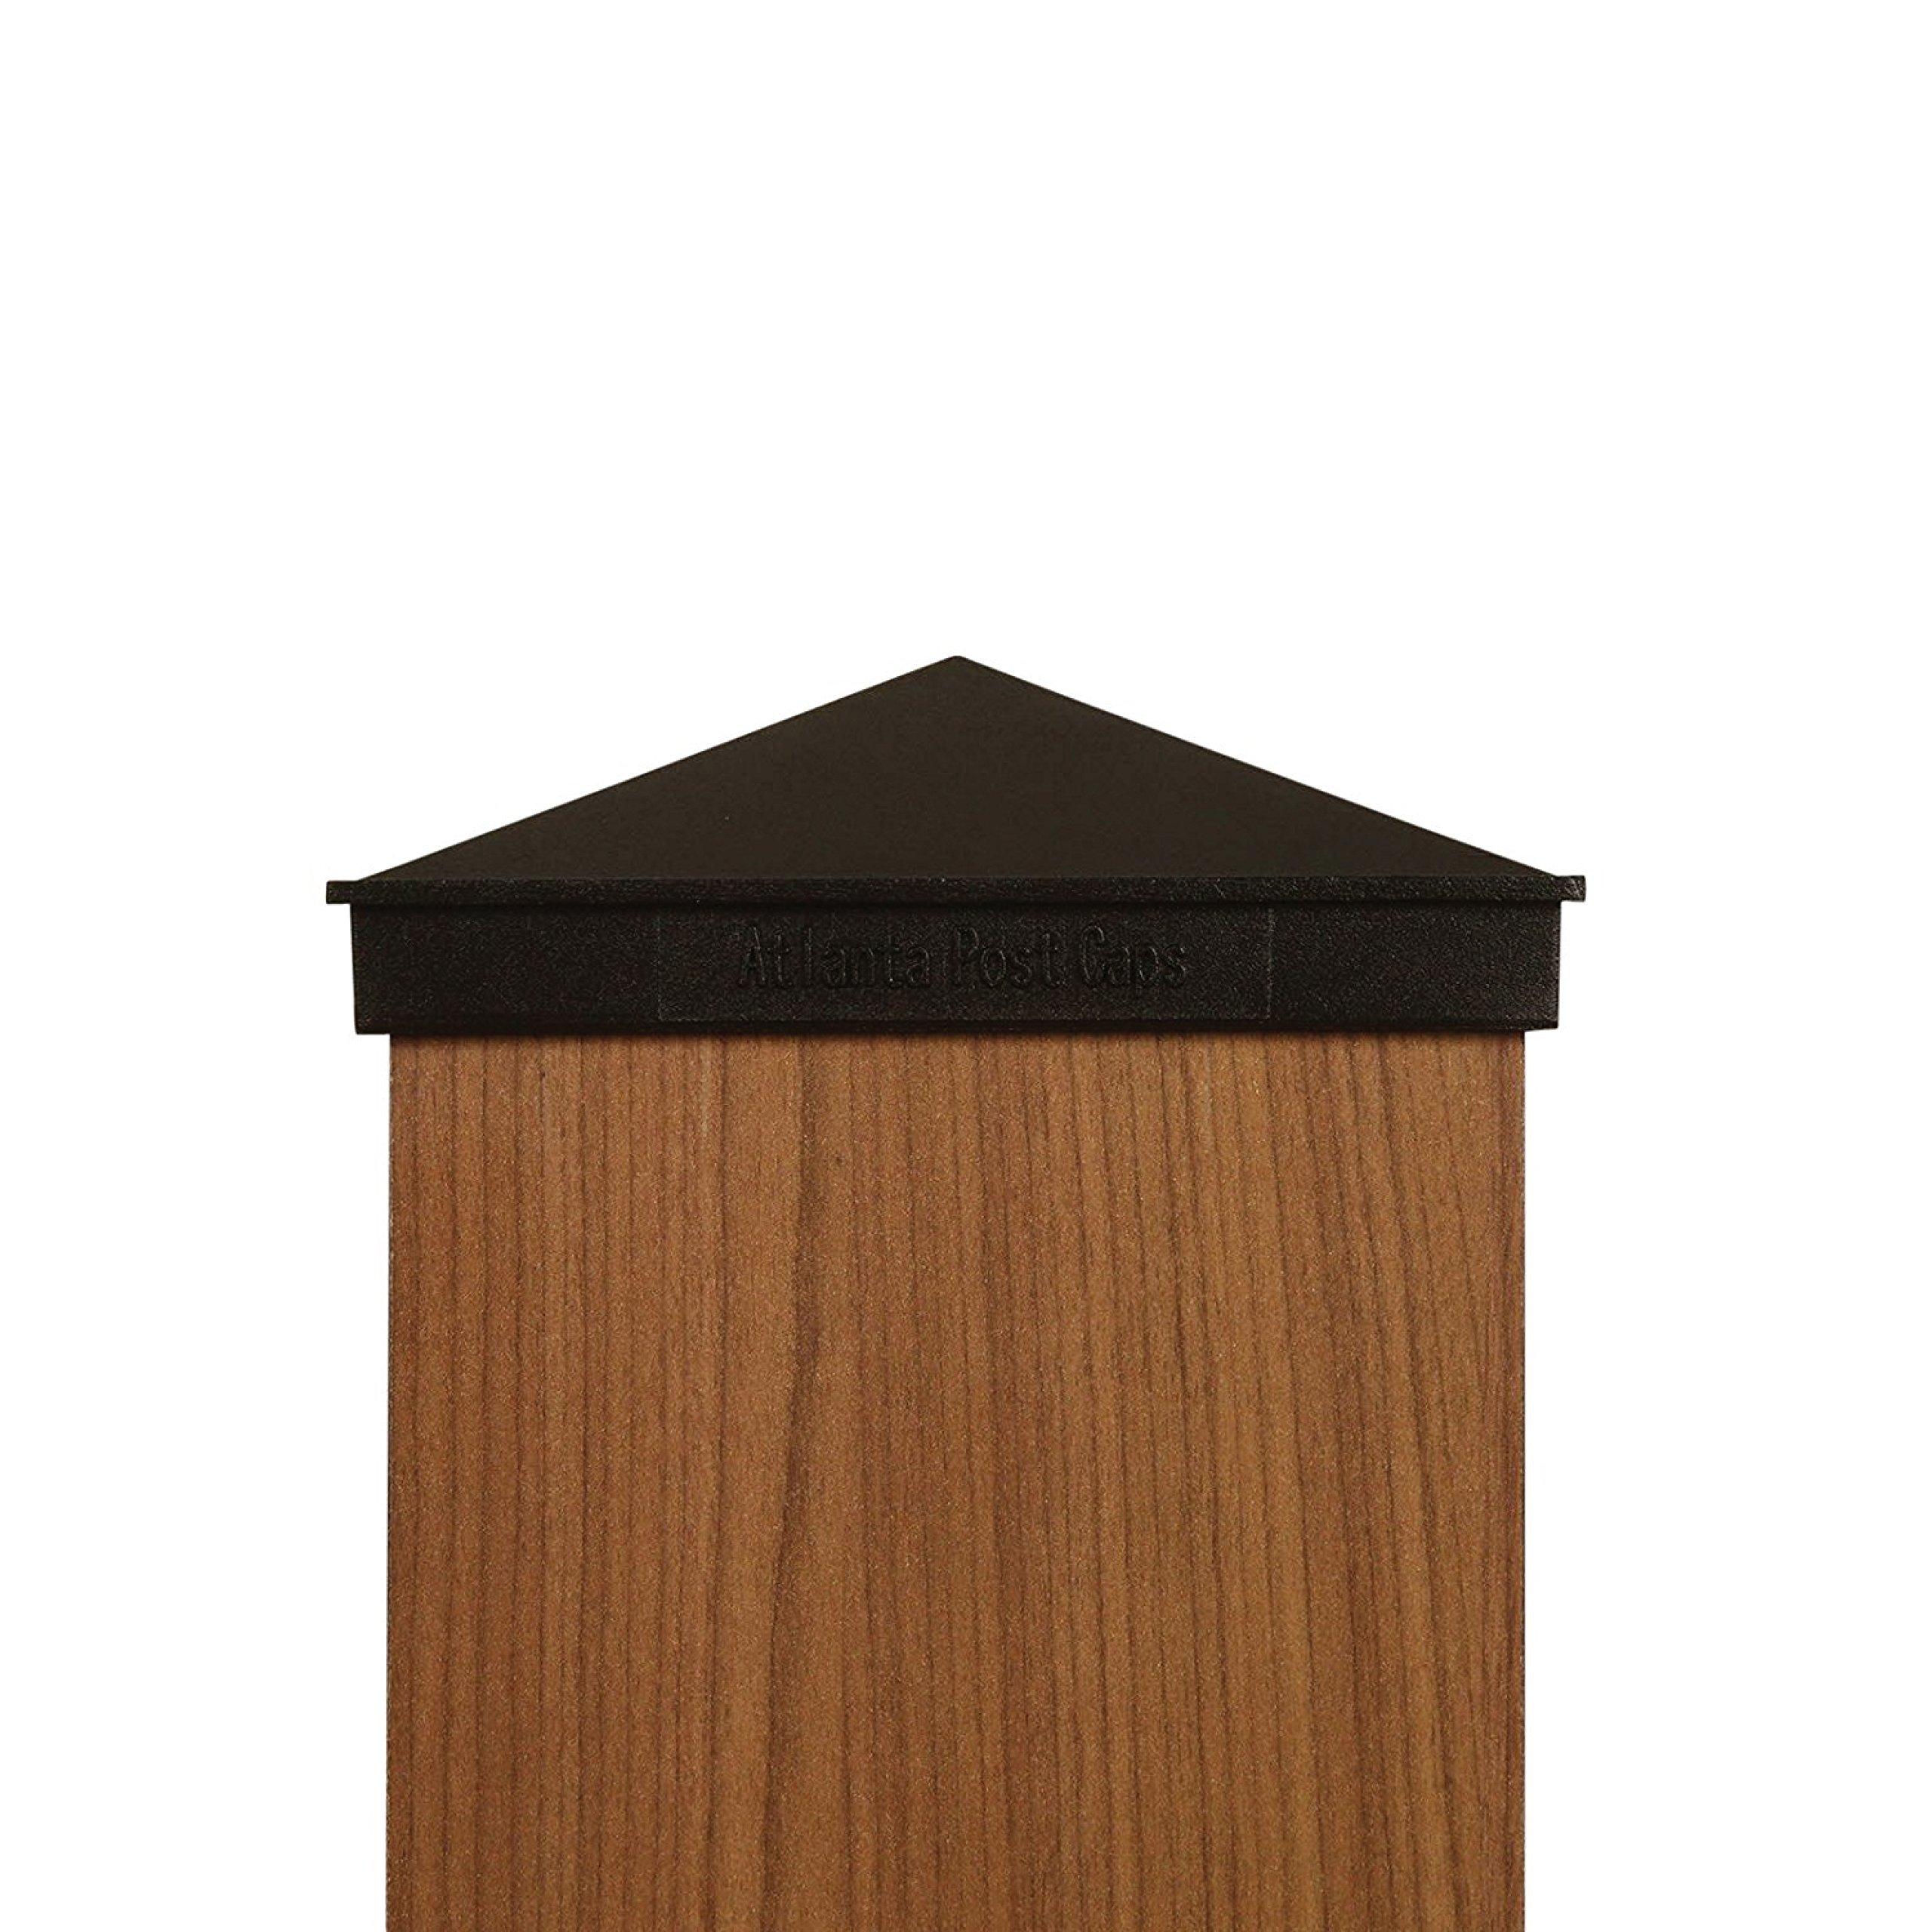 6x6 Post Cap | Black Pyramid Aluminum Coated Square Cap for Outdoor Fences, Mailboxes and Decks by Atlanta Post Caps